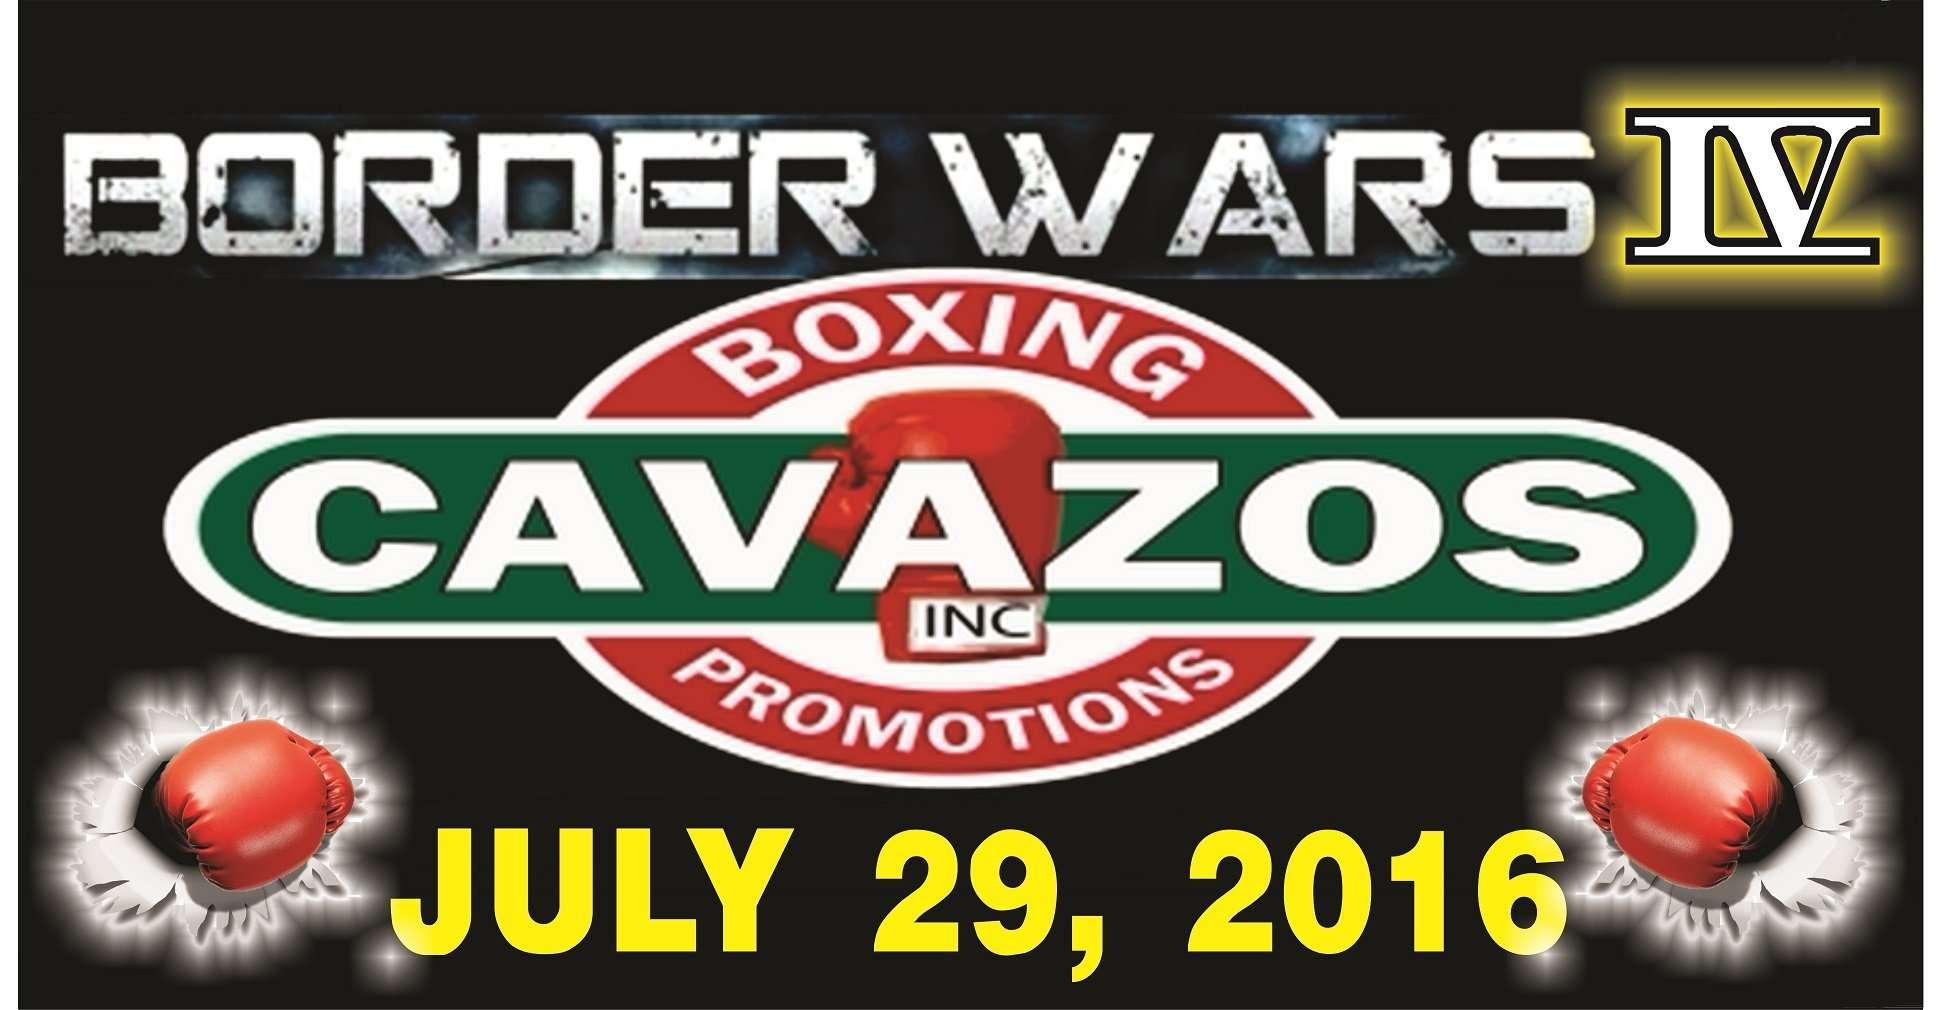 Border-Wars-IV-CAVAZOS-July-29